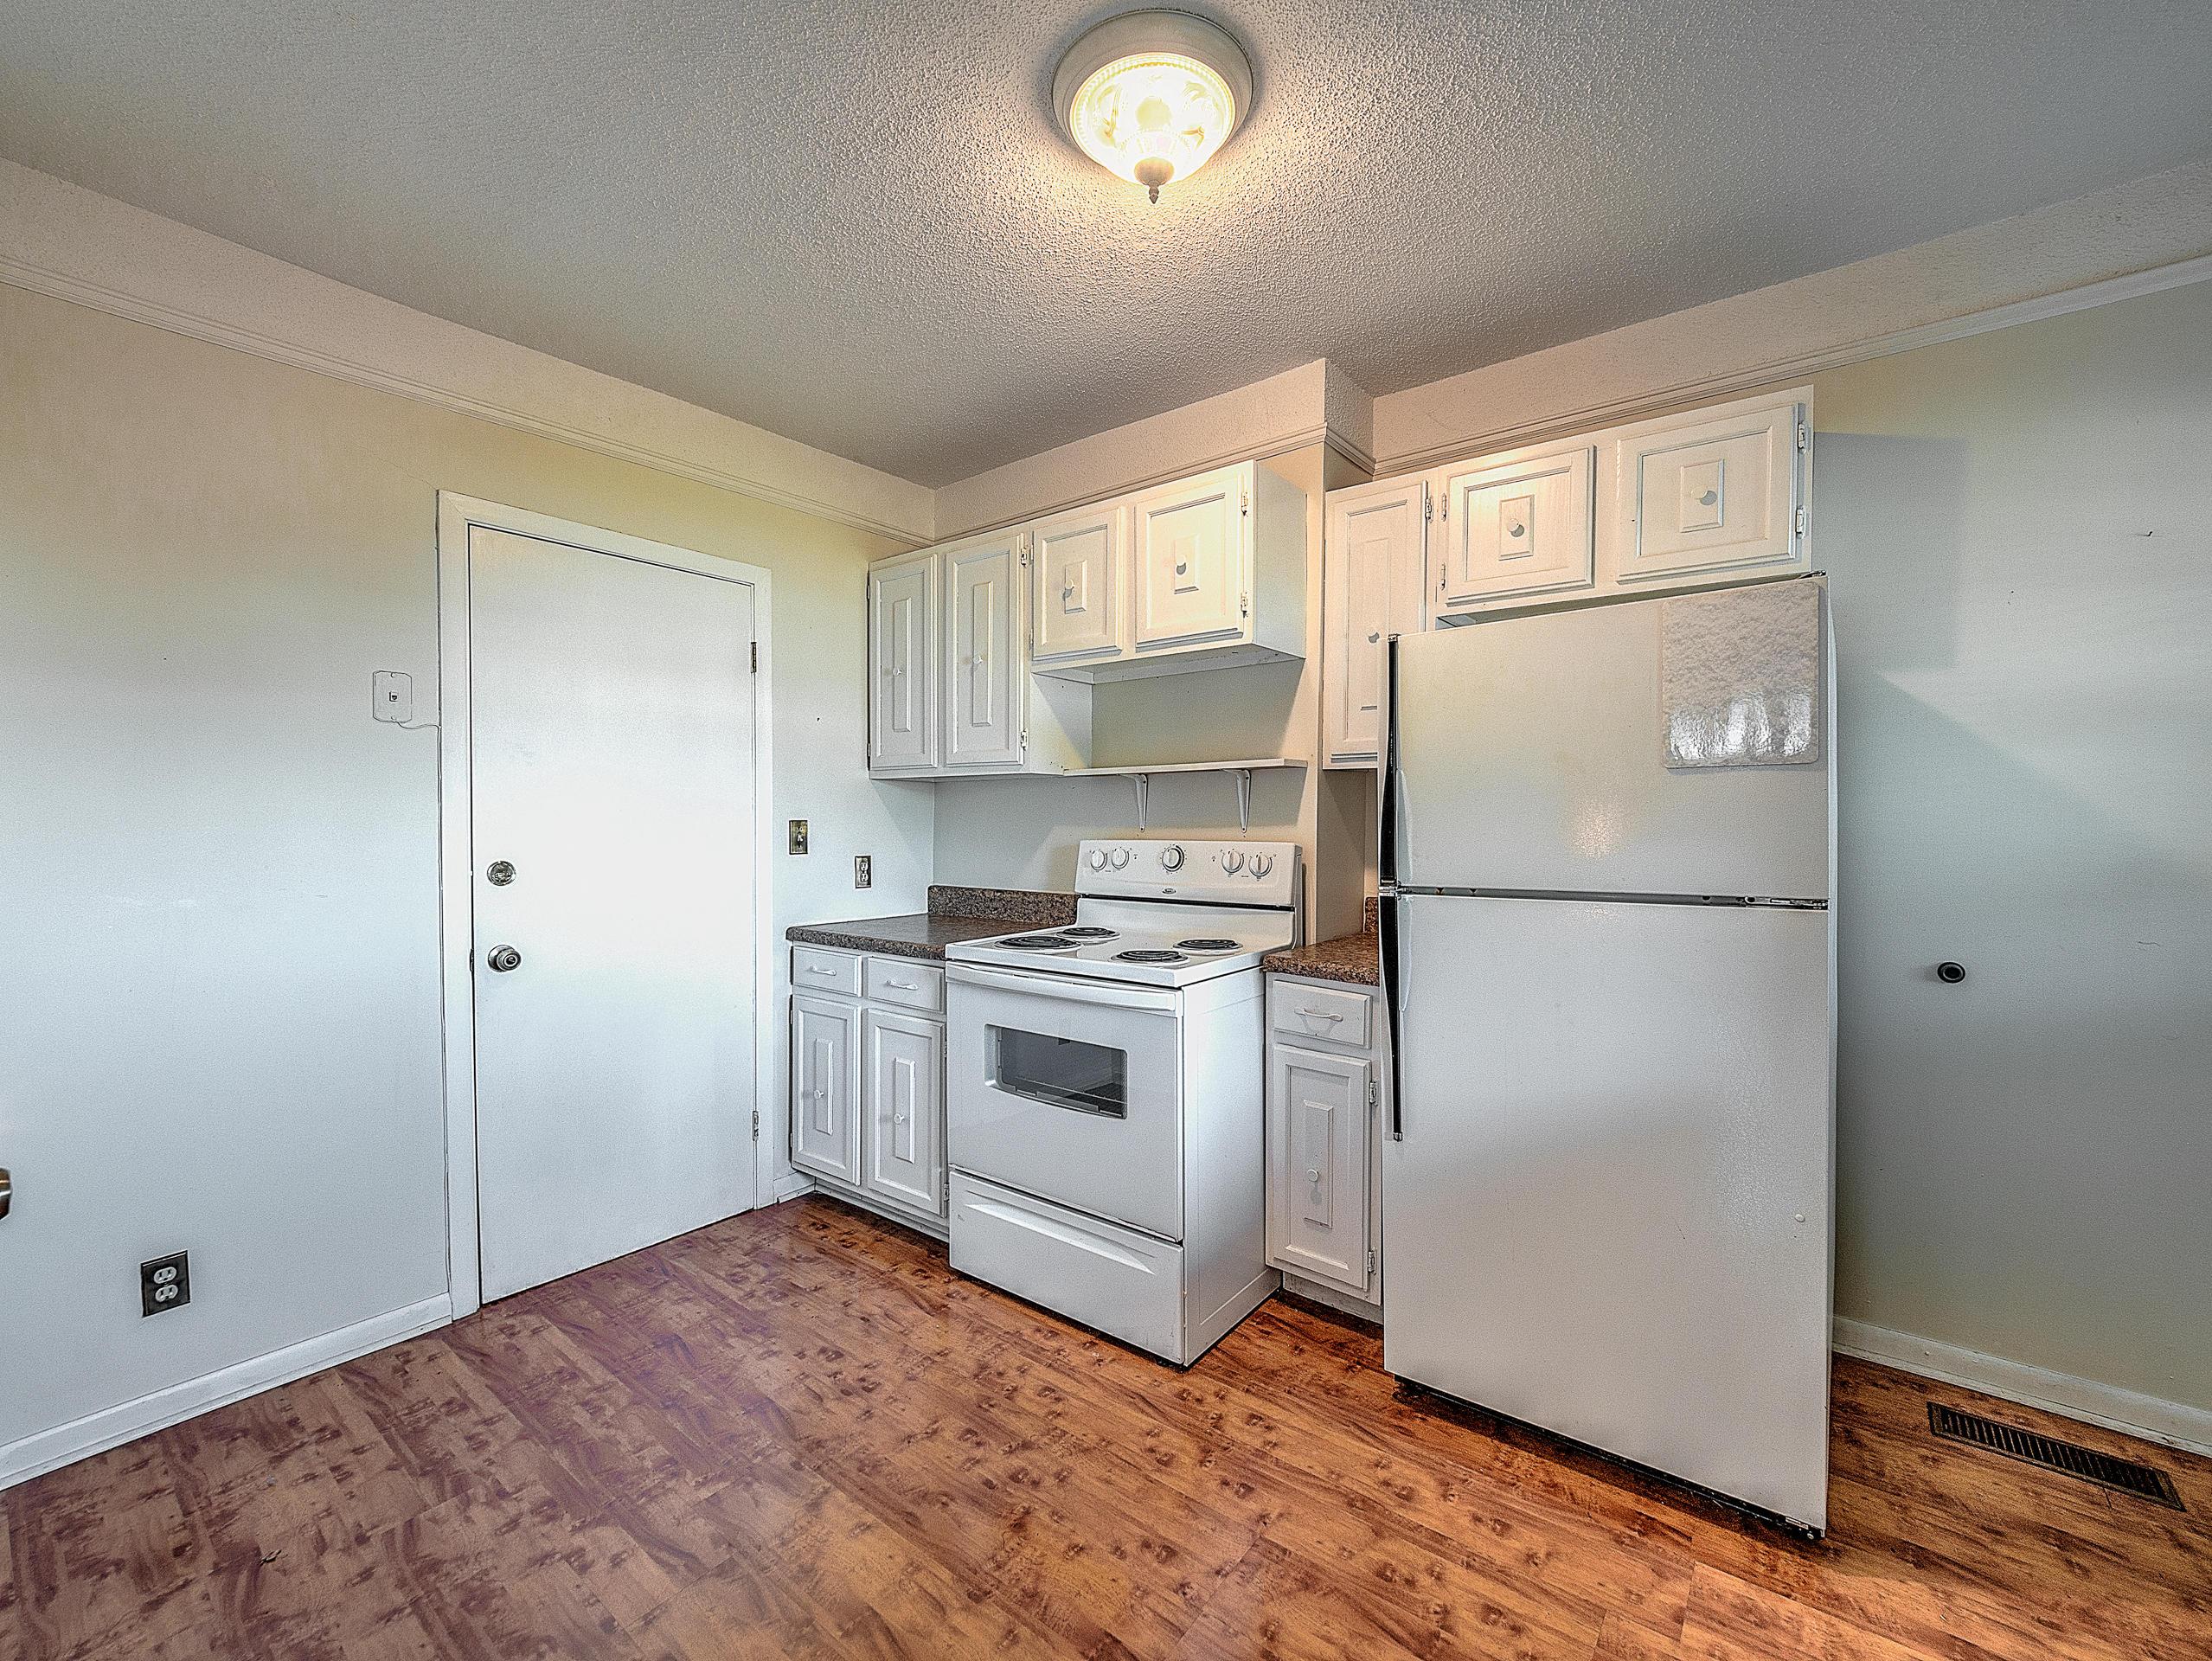 446 Shelby St, Kingsport, TN 37660